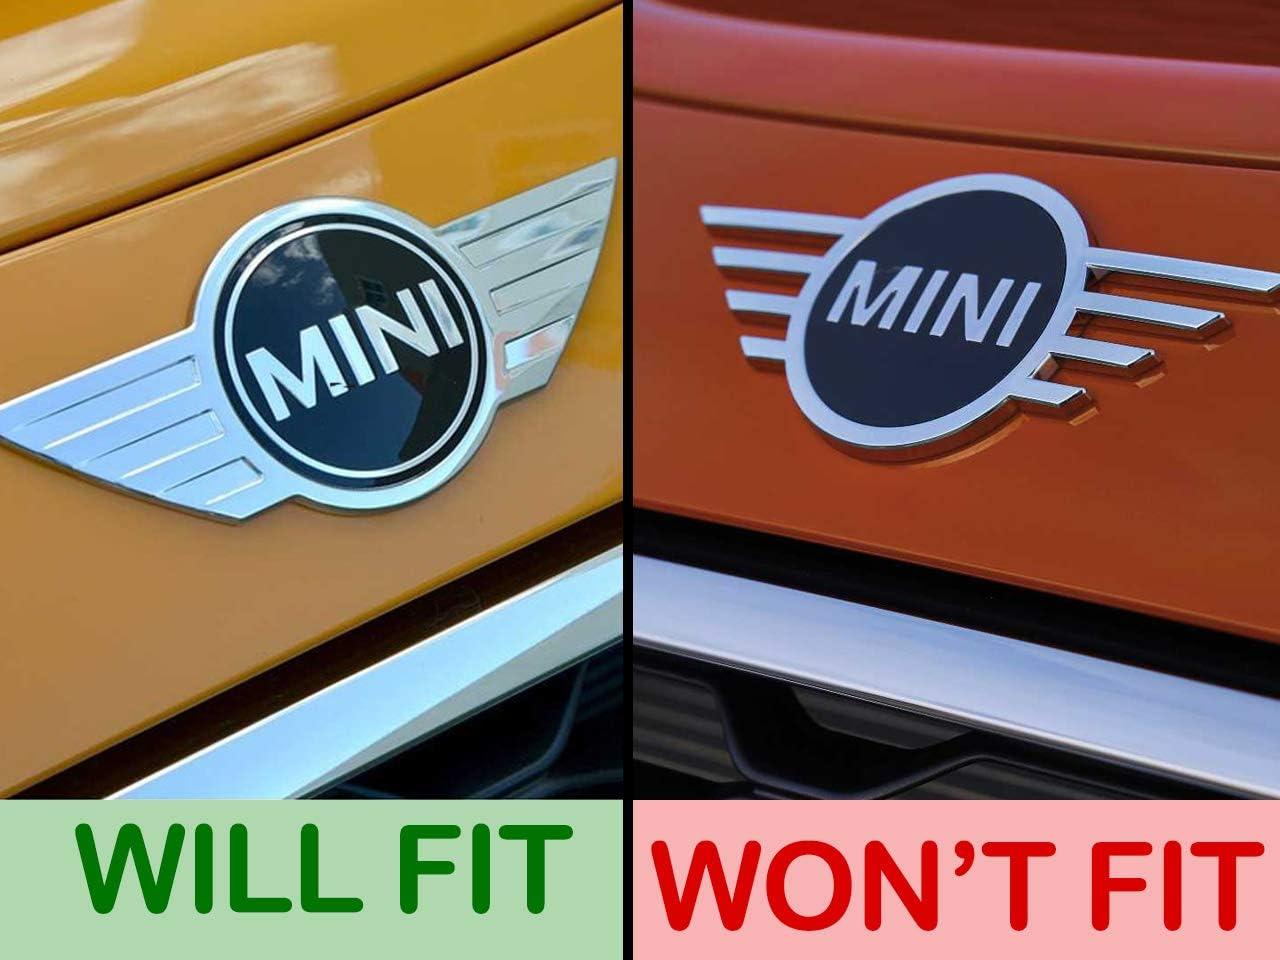 GAZOZ PERFORMANCE Front /& Rear Glossy Black Emblem Badge Cover for 2007-2013 Mini Cooper S R55 R56 R57 Mk2